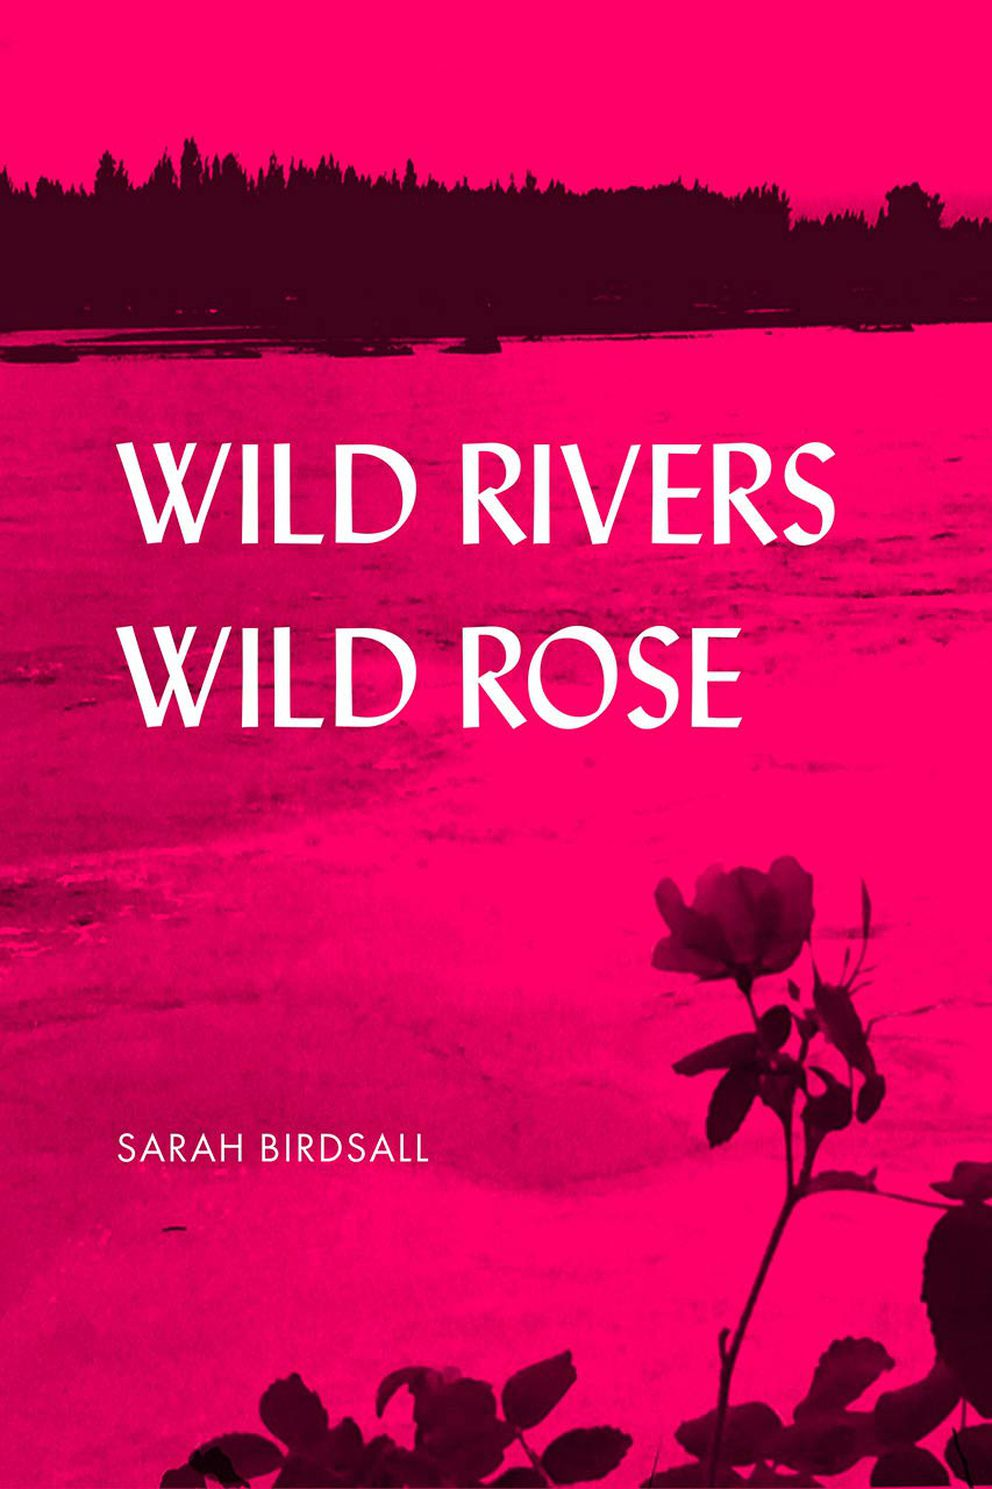 'Wild Rivers, Wild Rose, ' by Sarah Birdsall